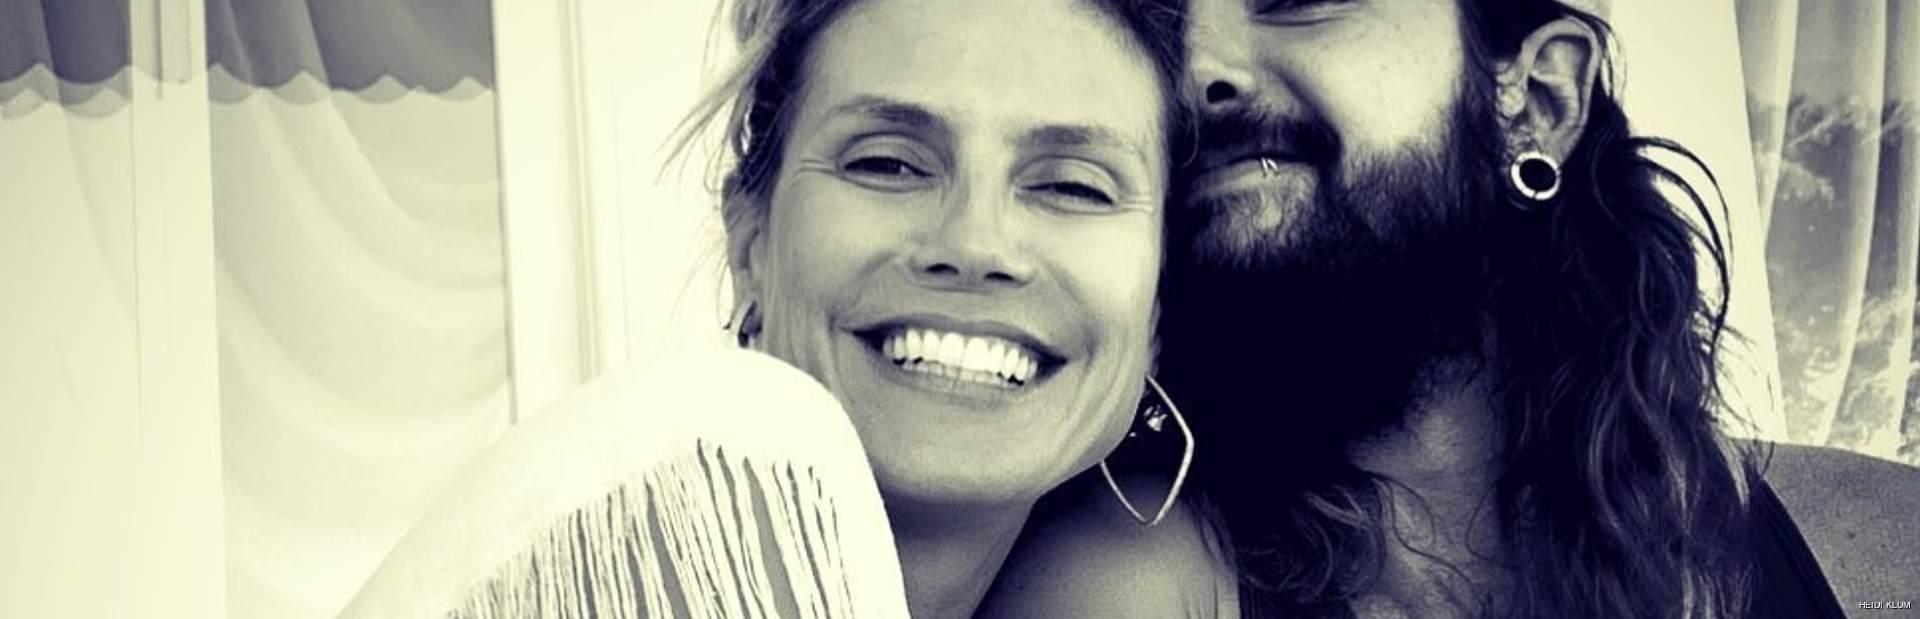 Heidi Klum shares snaps of her Capri wedding on board Jackie O's superyacht 'Christina O'